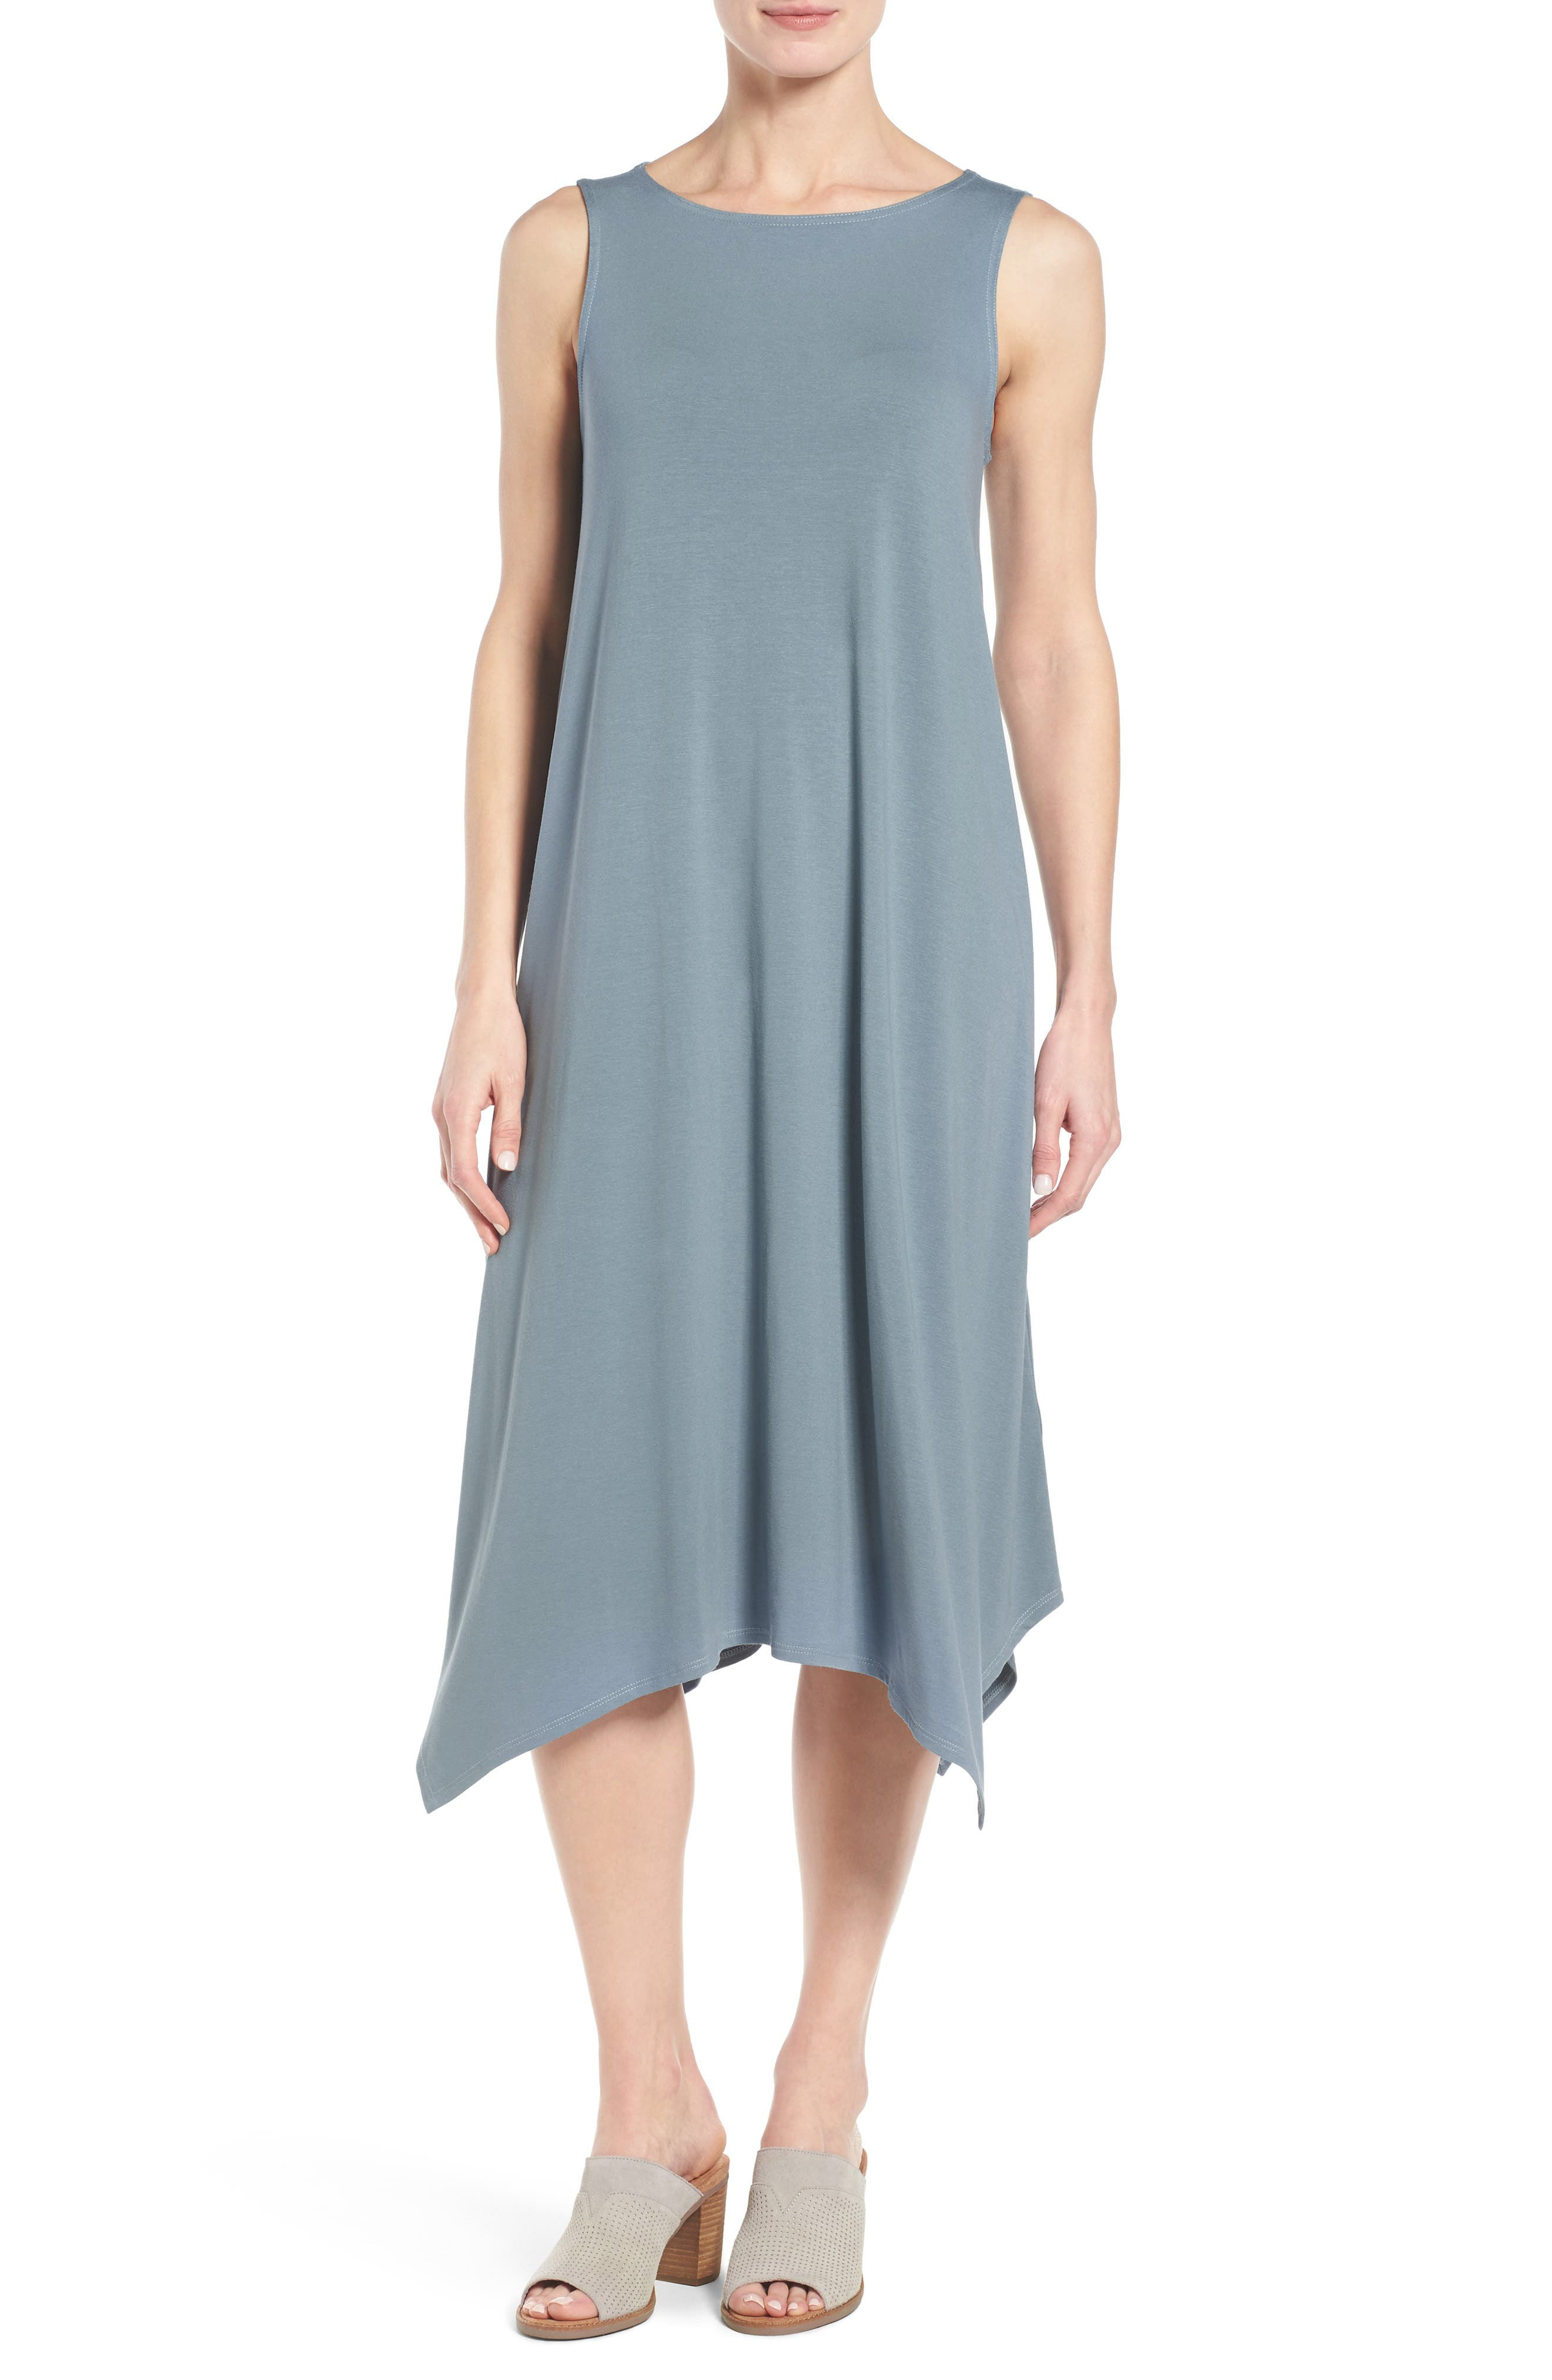 Alternate Image 1 Selected - Eileen Fisher Jersey Midi Dress (Regular & Petite)